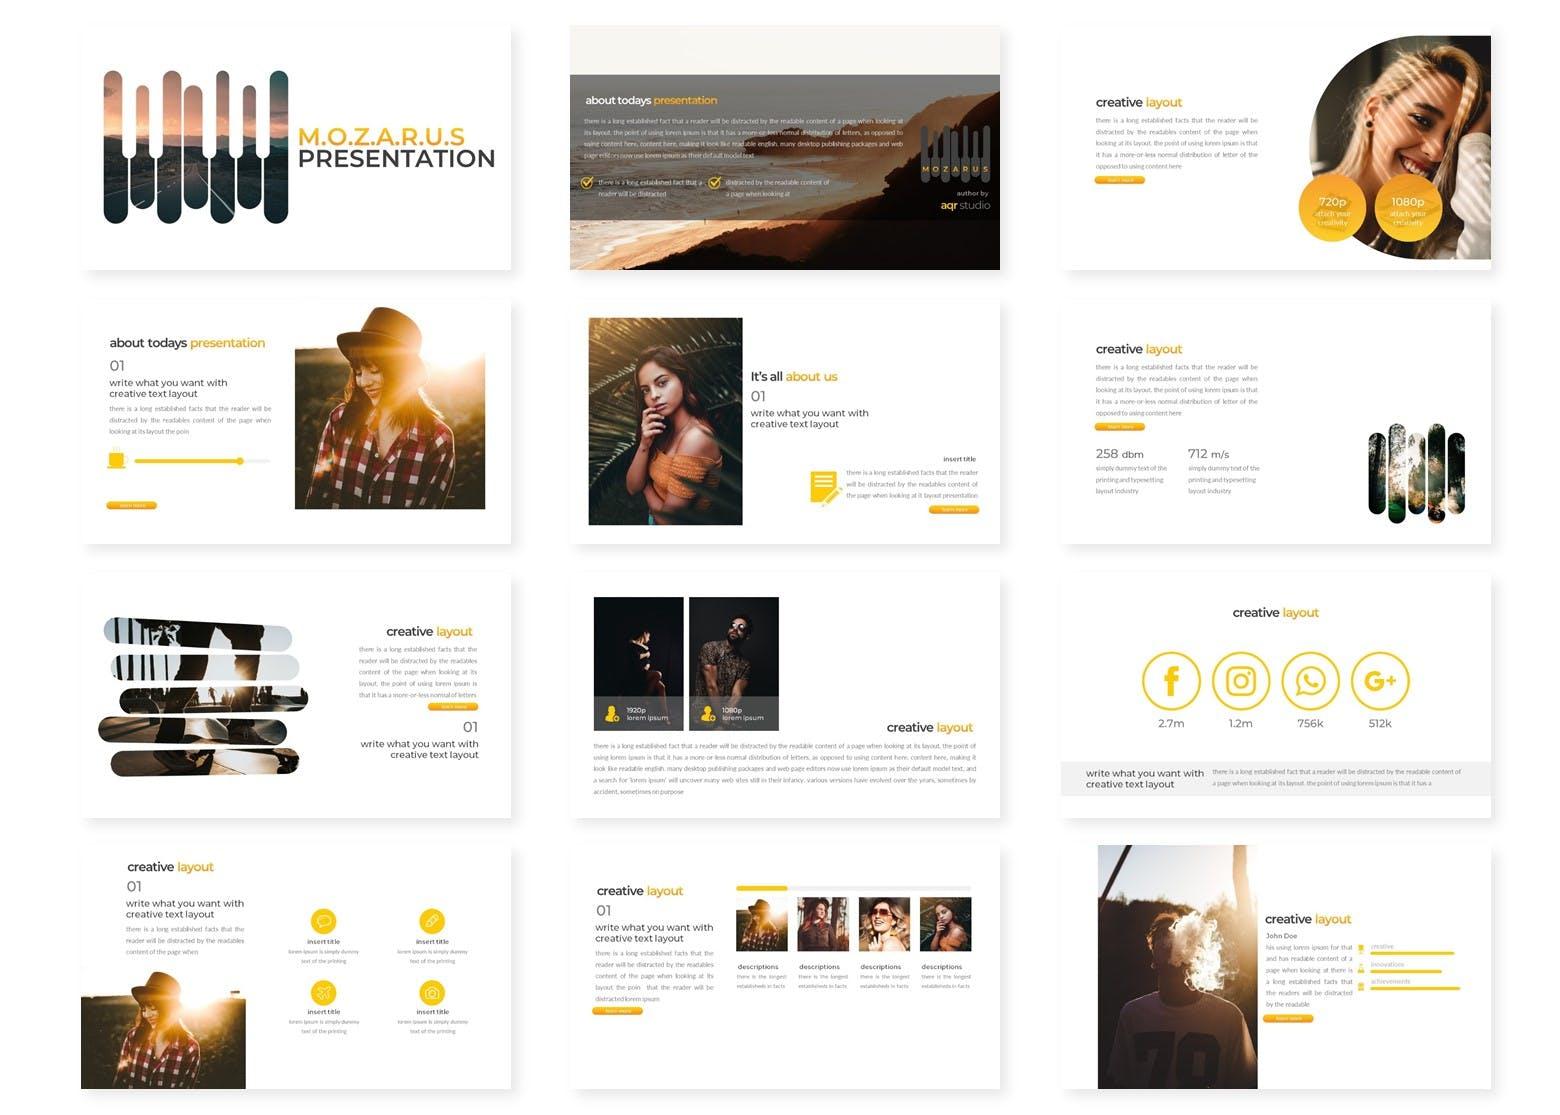 Google幻灯片创意排版设计时尚模板素材 Mozarus – Google Slides Template设计素材模板